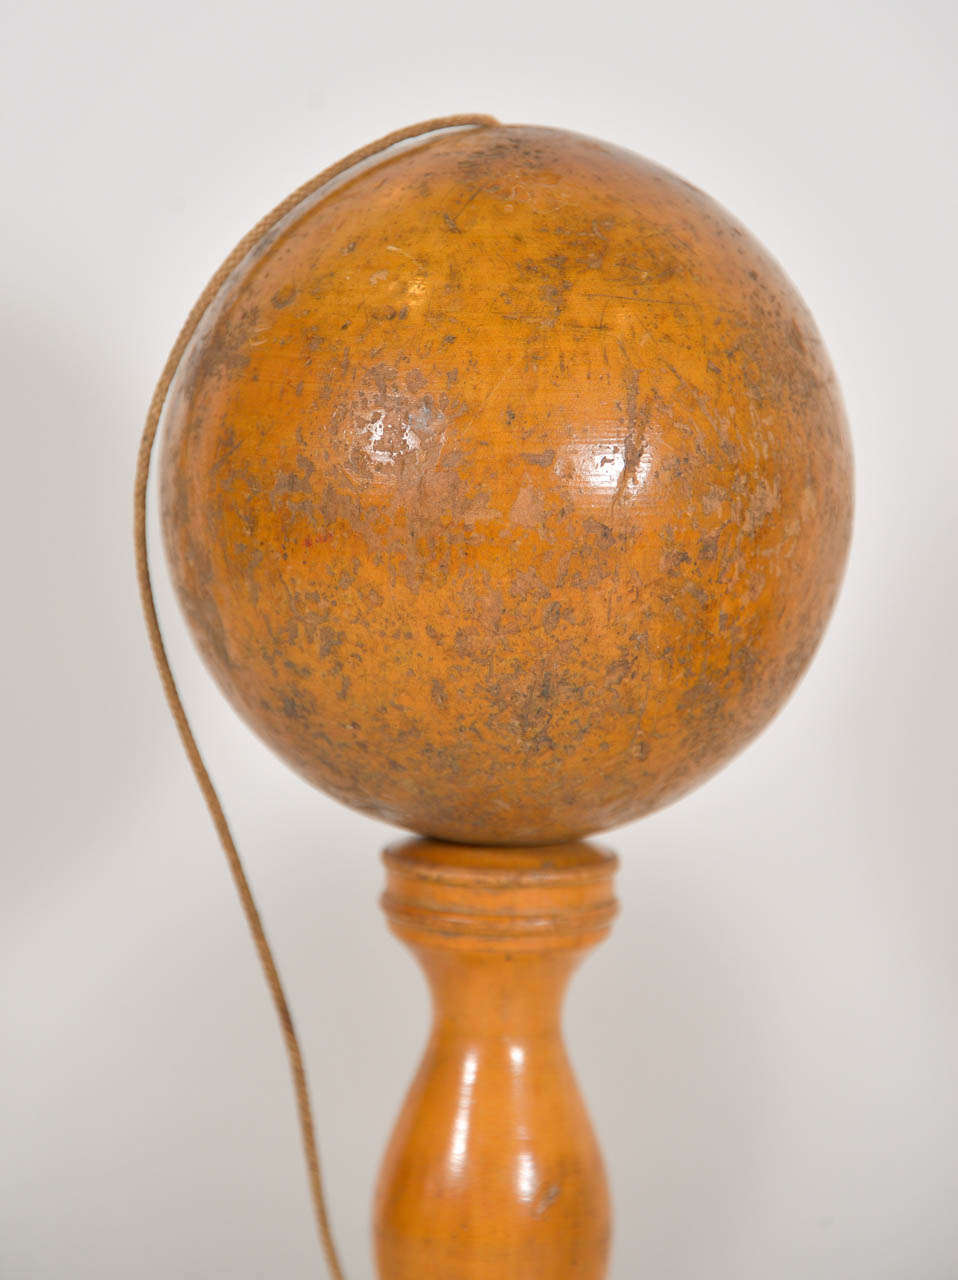 19th Century Belgium Biblioquet, Child's Toy In Excellent Condition For Sale In Houston, TX